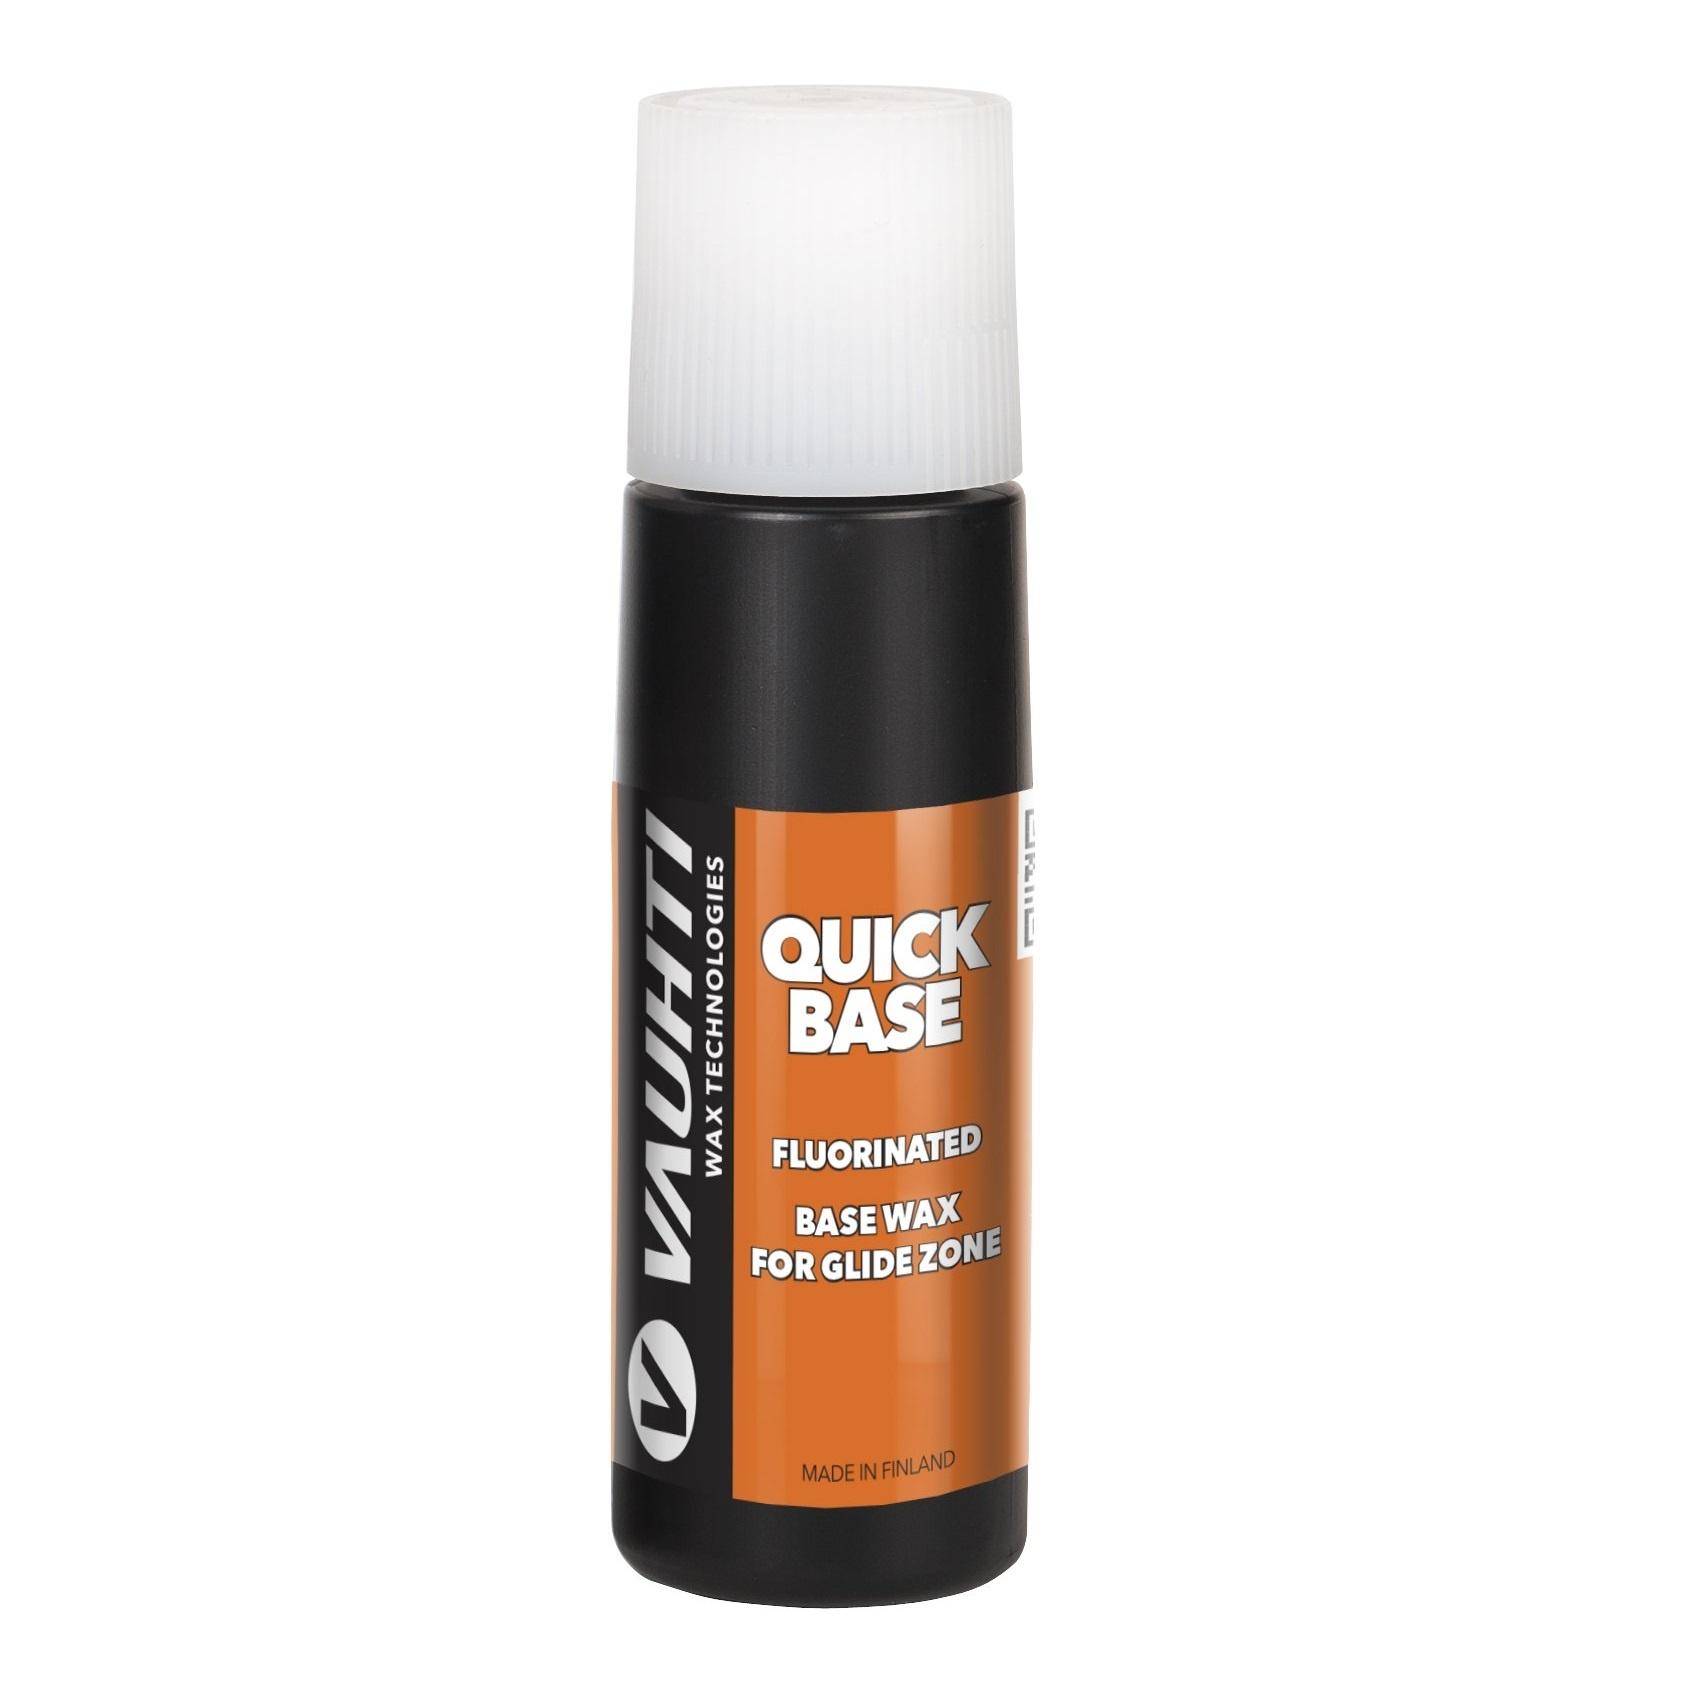 Quick Base Fluorinated Base Wax